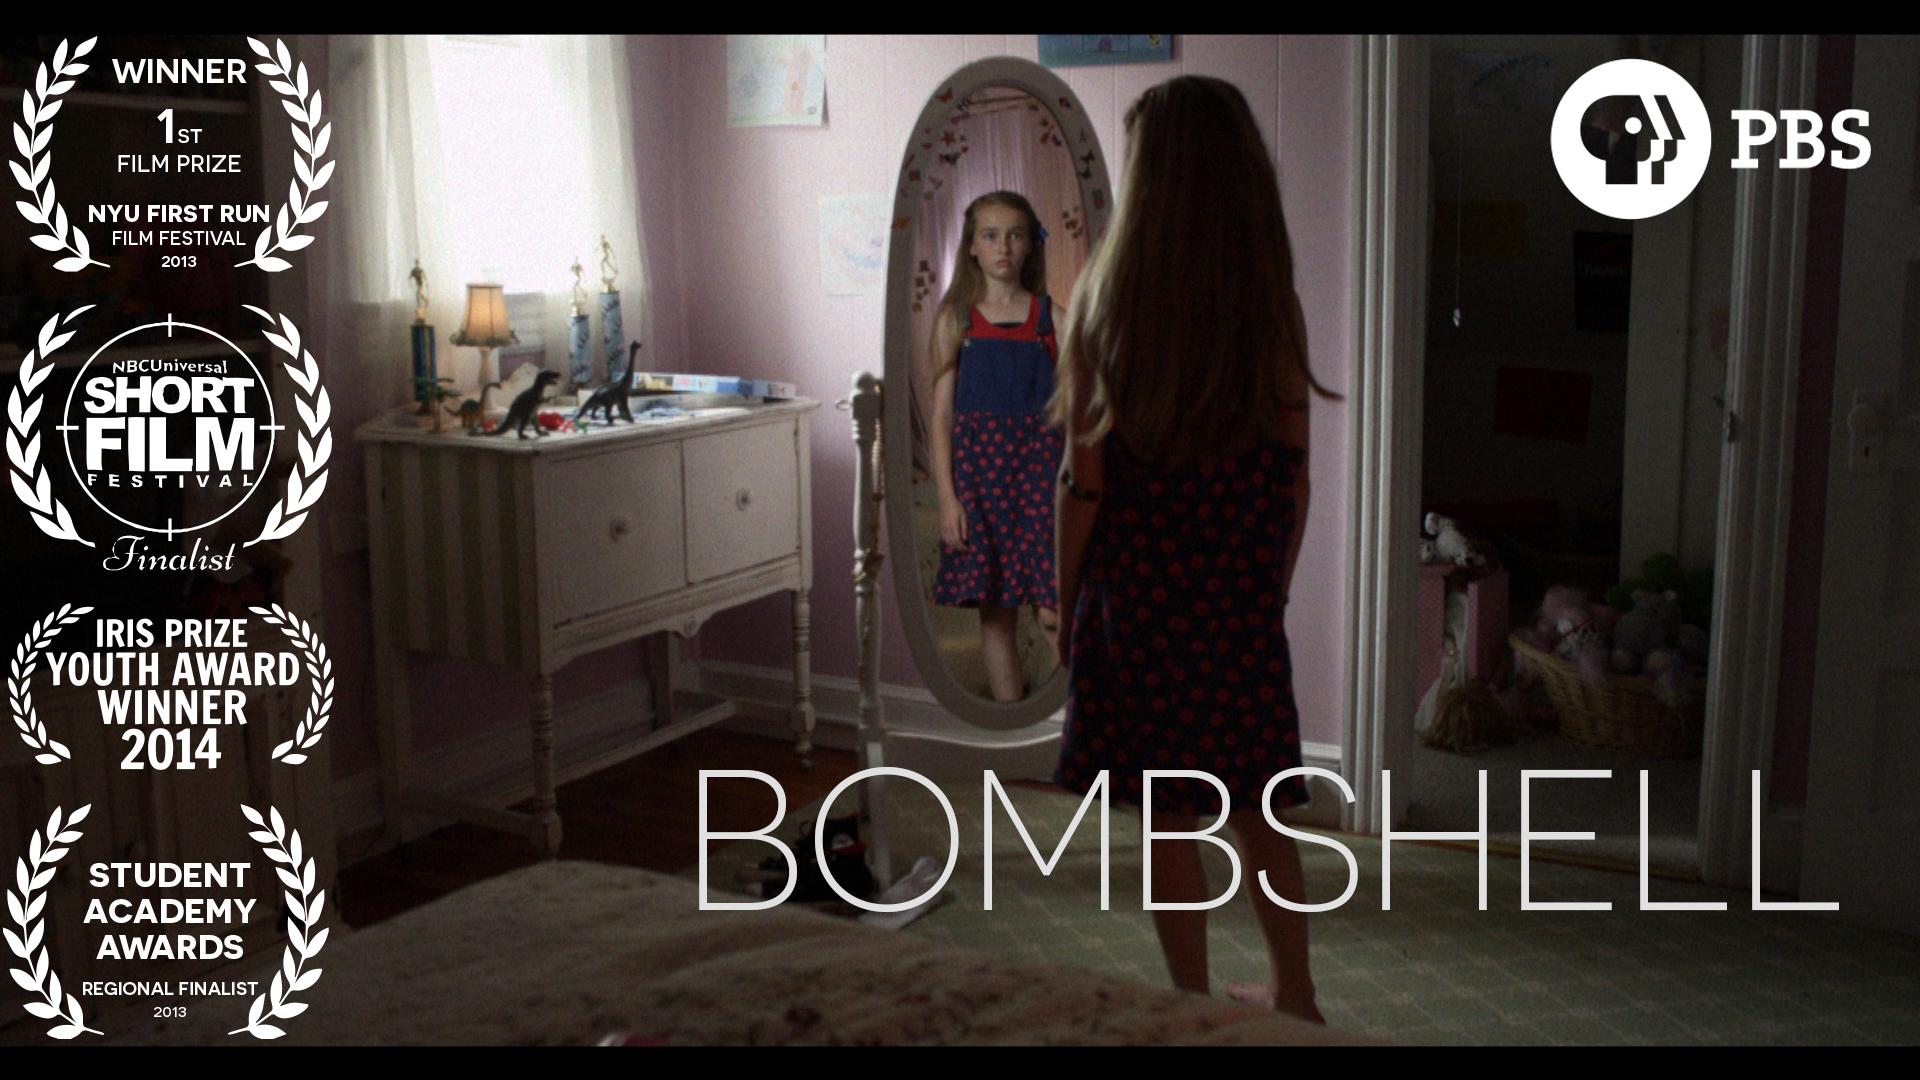 Bombshell_VIMEOSTILLwTITLE_pbs.jpg